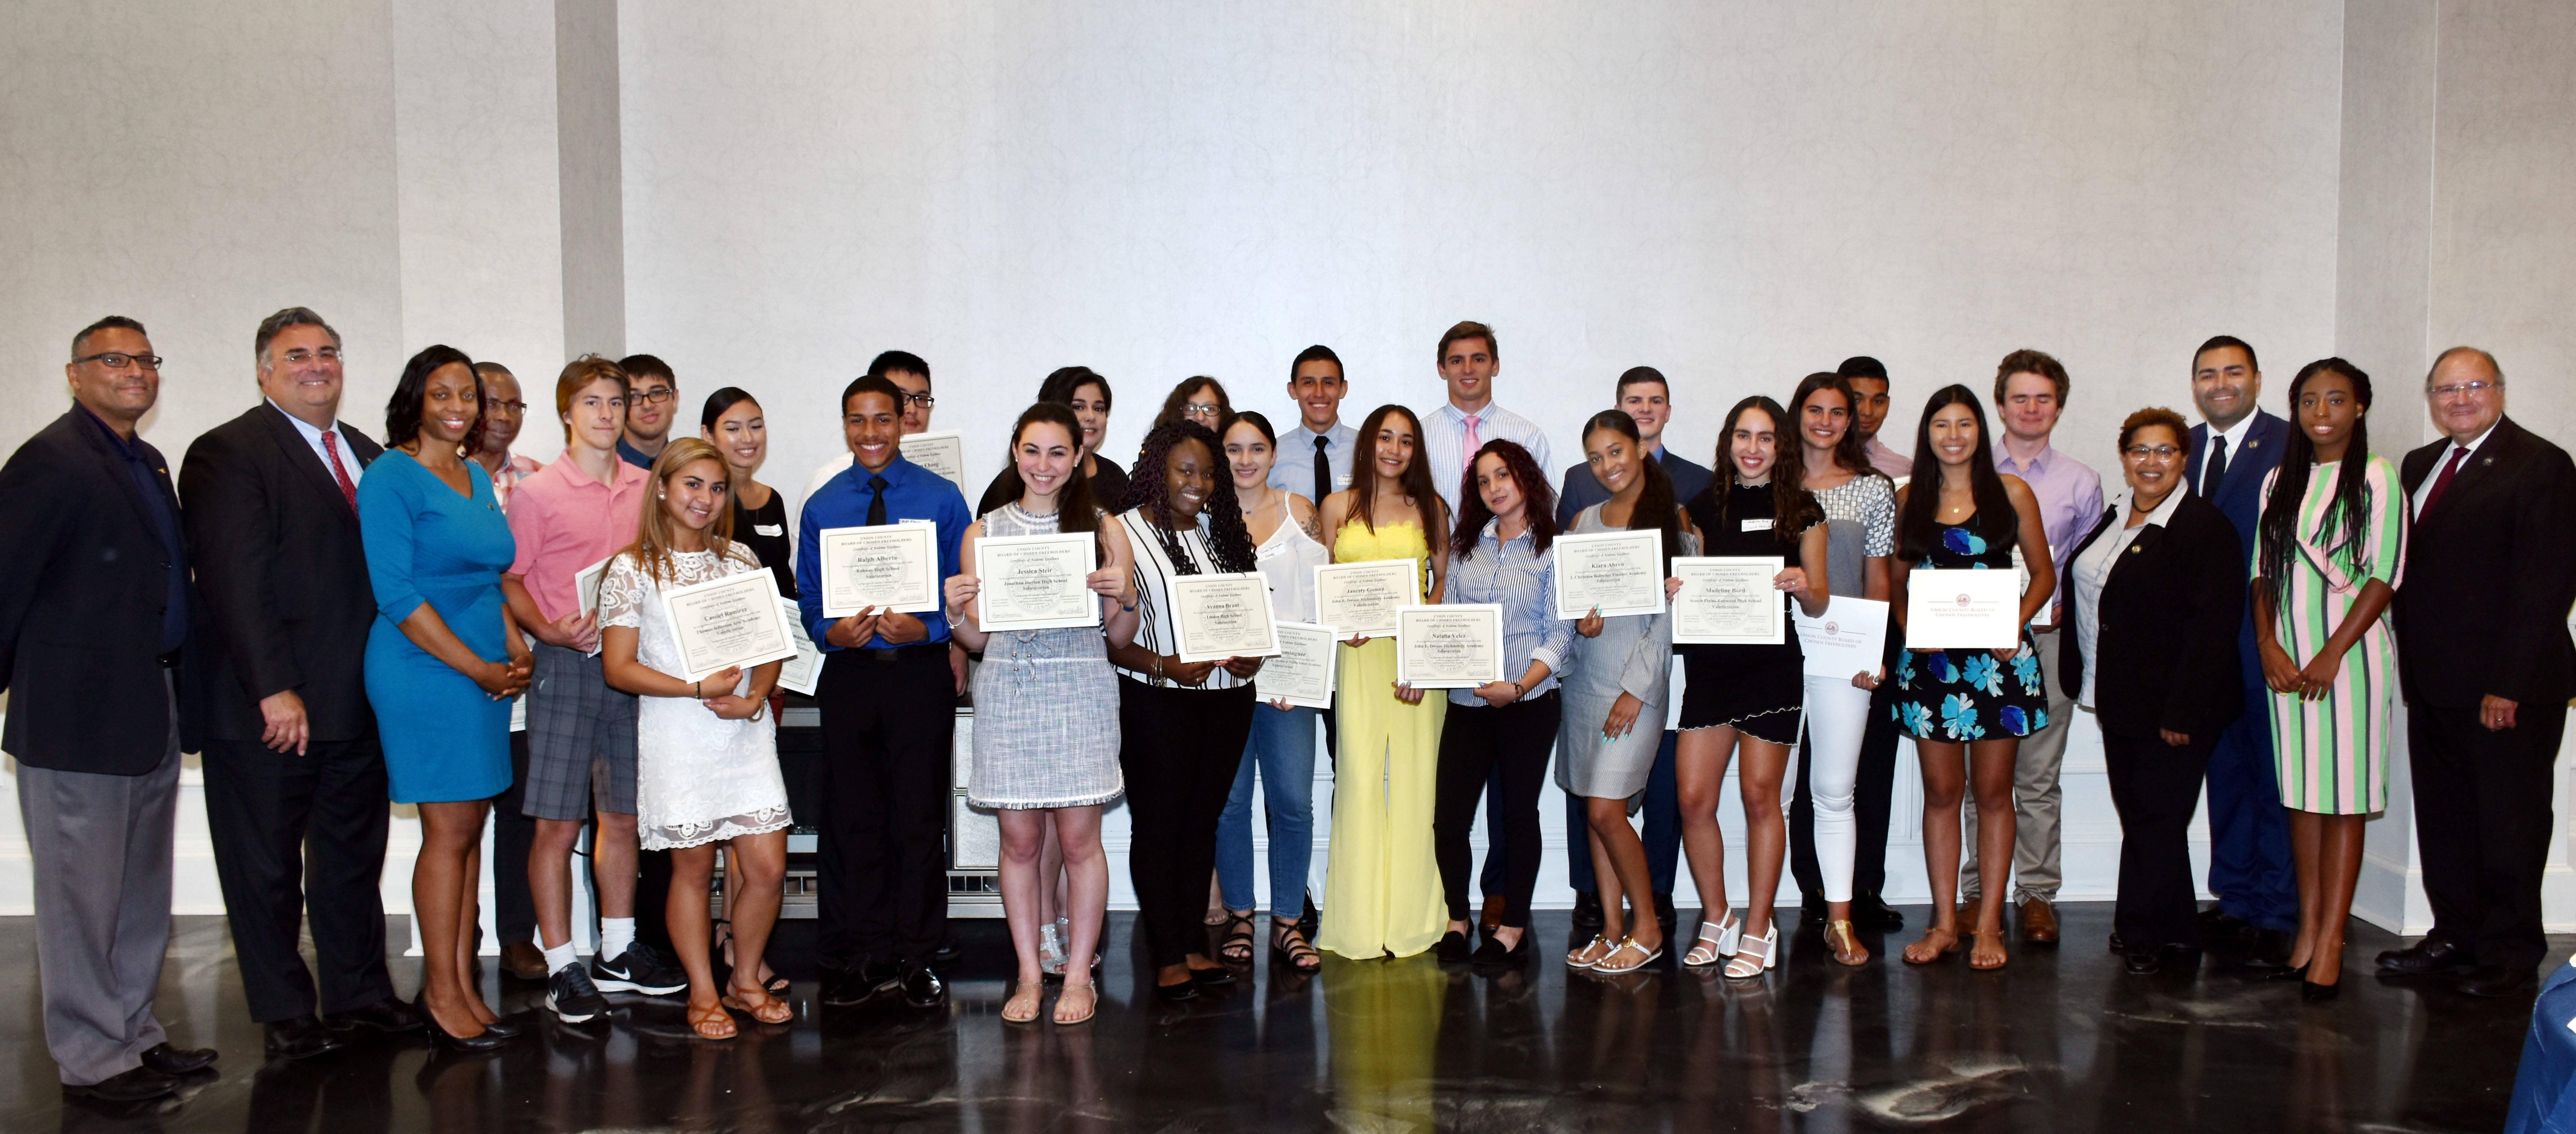 768880cfb0b0b2ee9fb2_Academic_Excellence_Awards.jpg